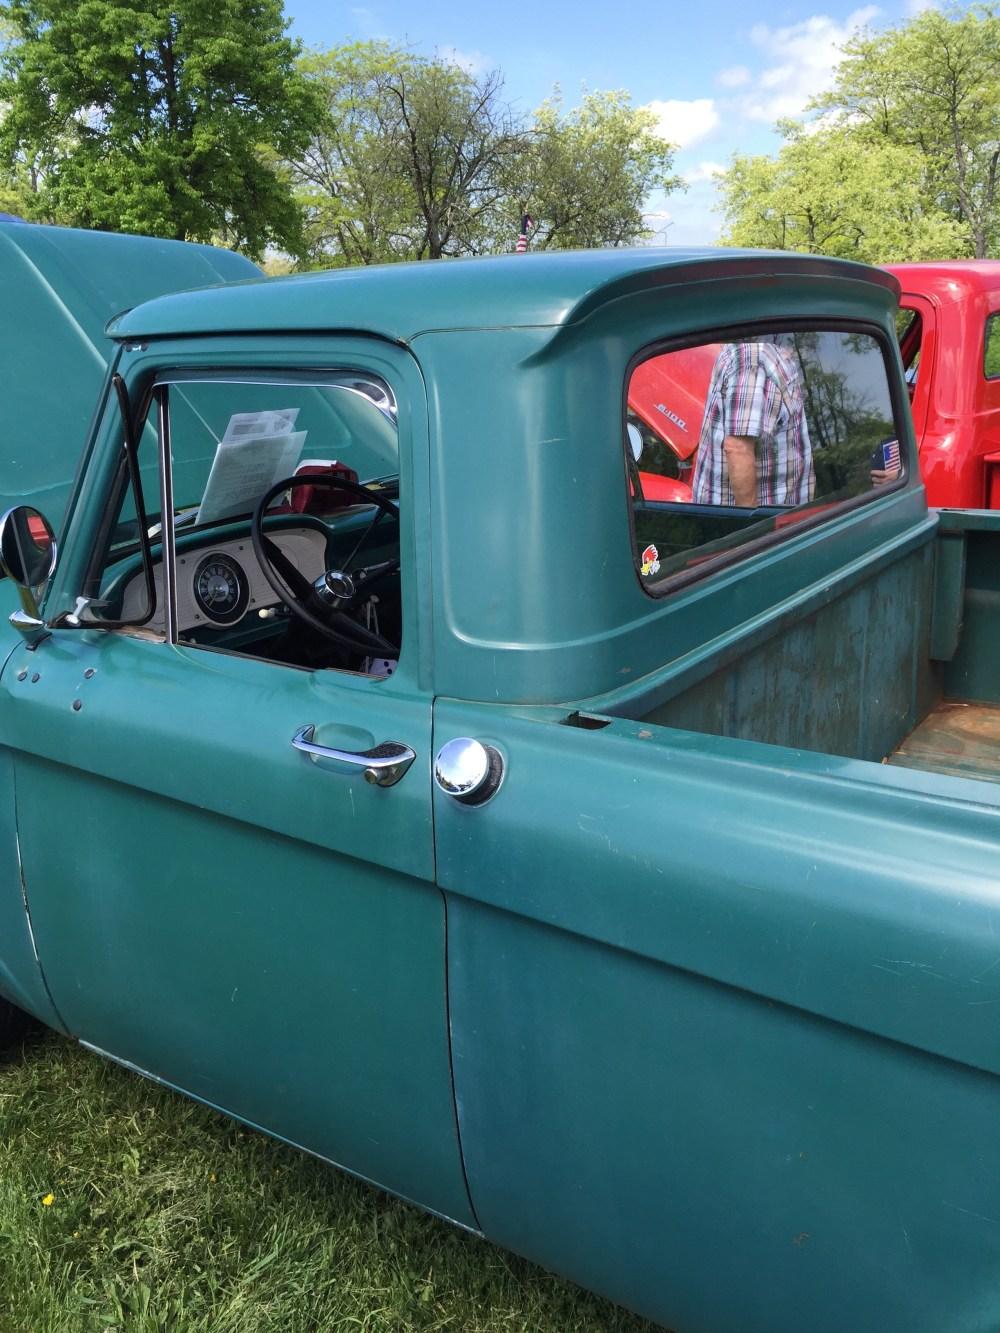 medium resolution of file 1961 ford f100 unibody pickup design factory original at 2015 shenandoah aaca meet 5of6 jpg